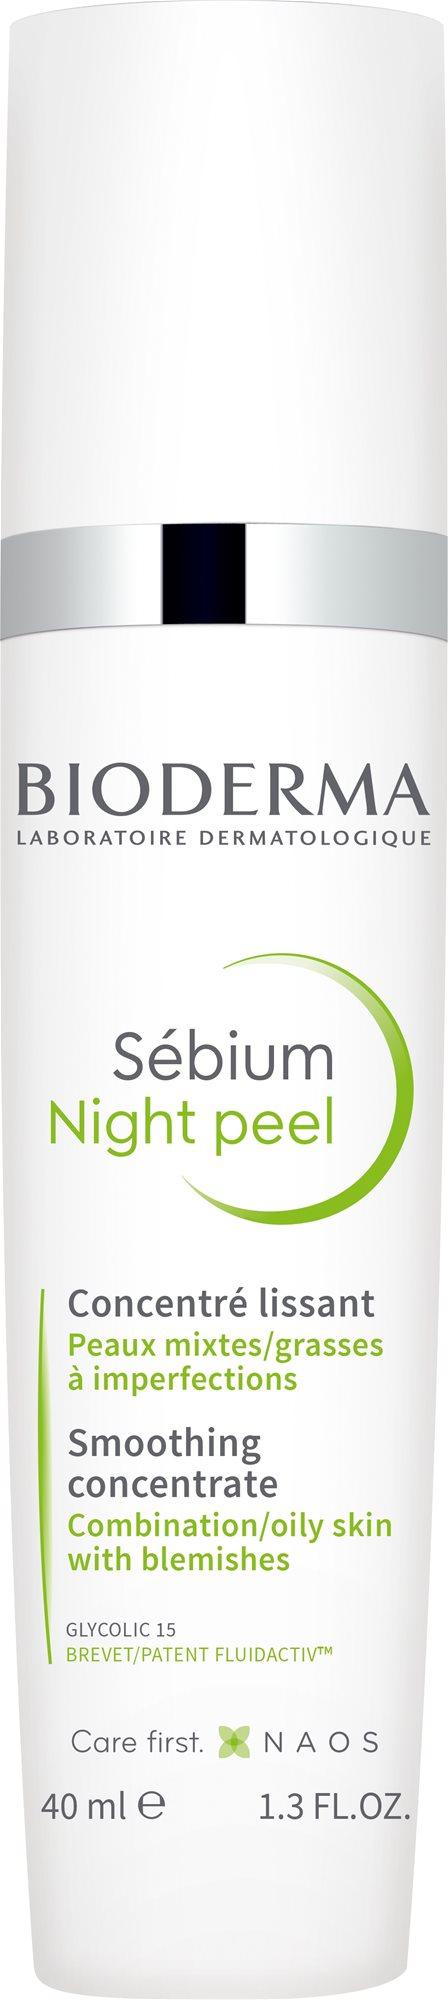 BIODERMA Night Peel 40 ml